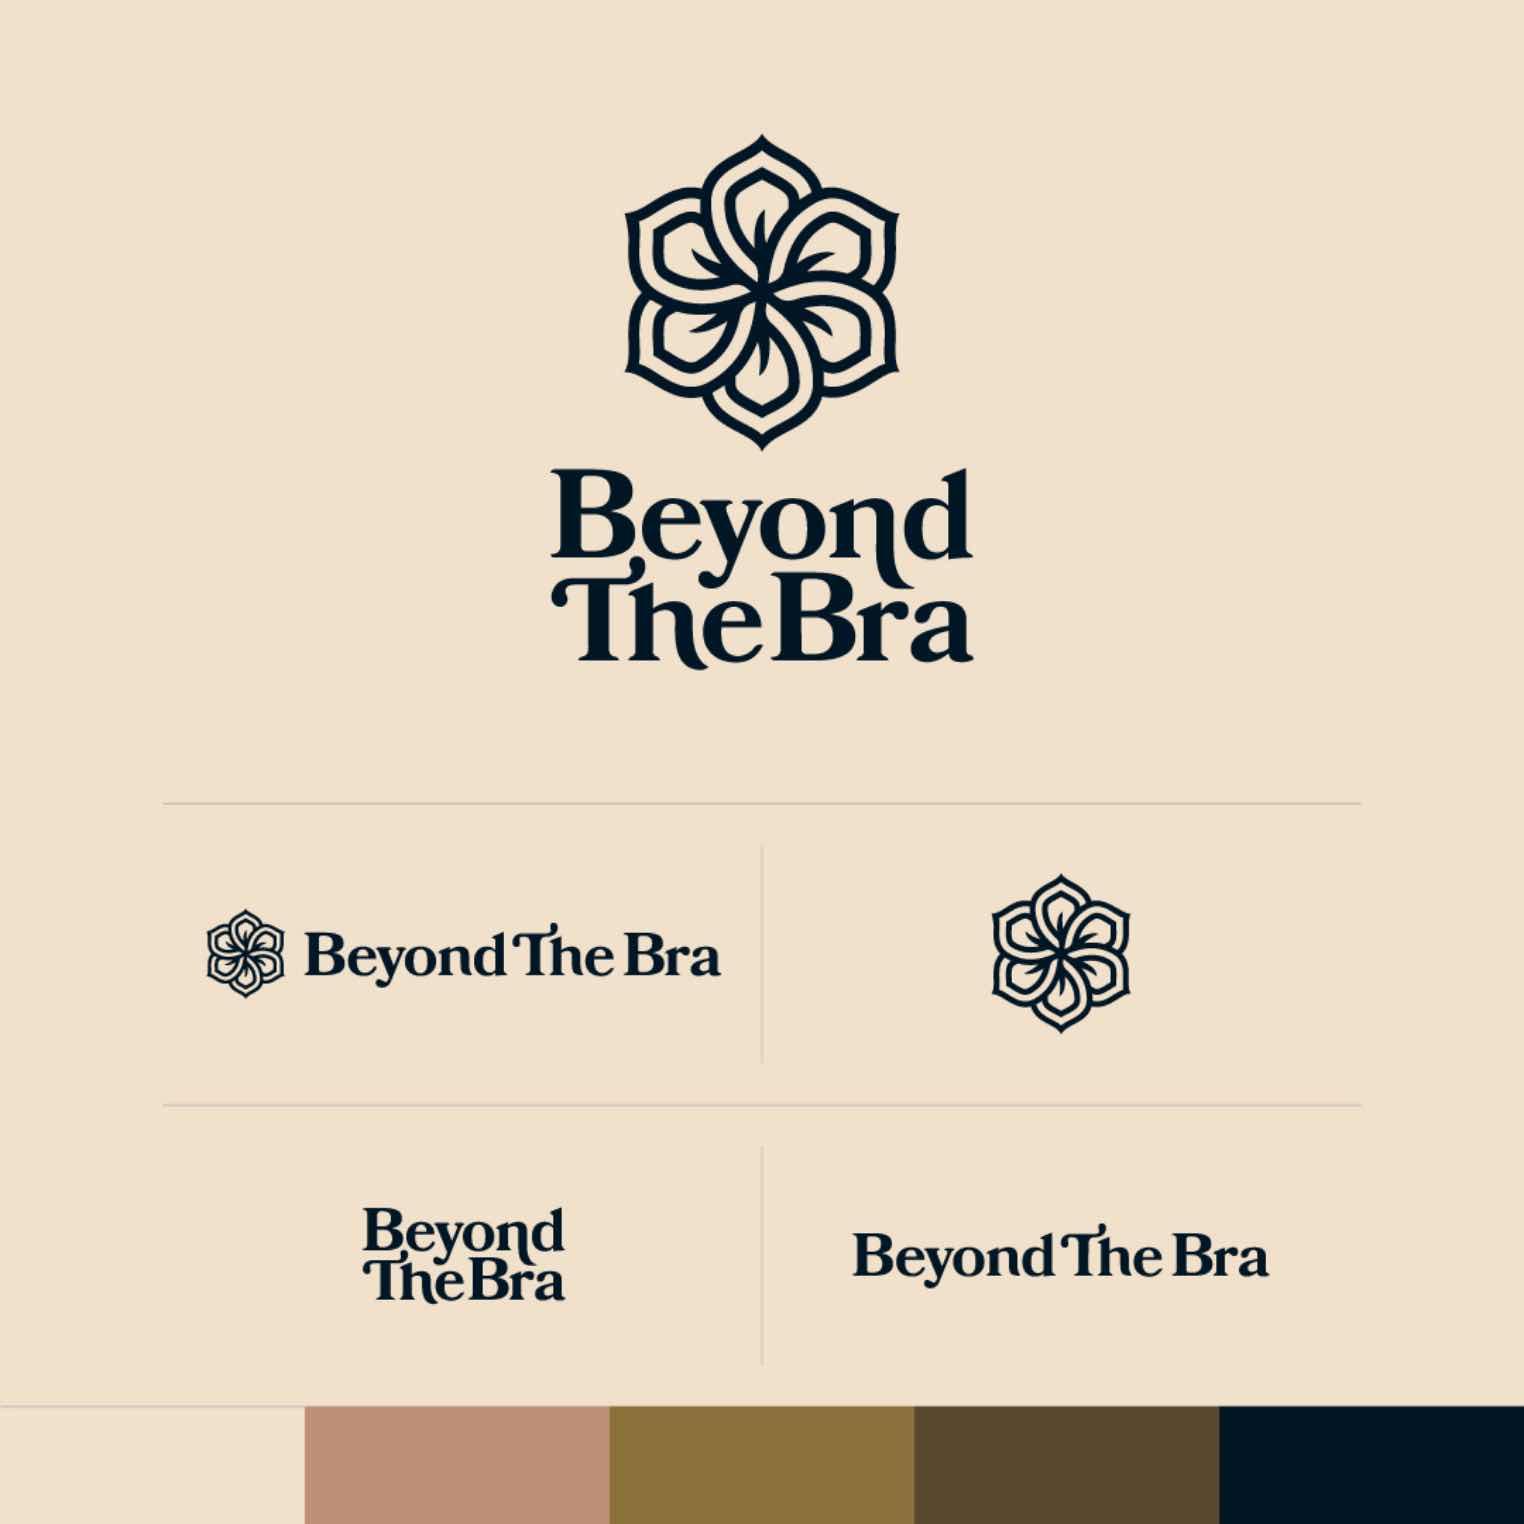 Beyond The Bra specimen sheet